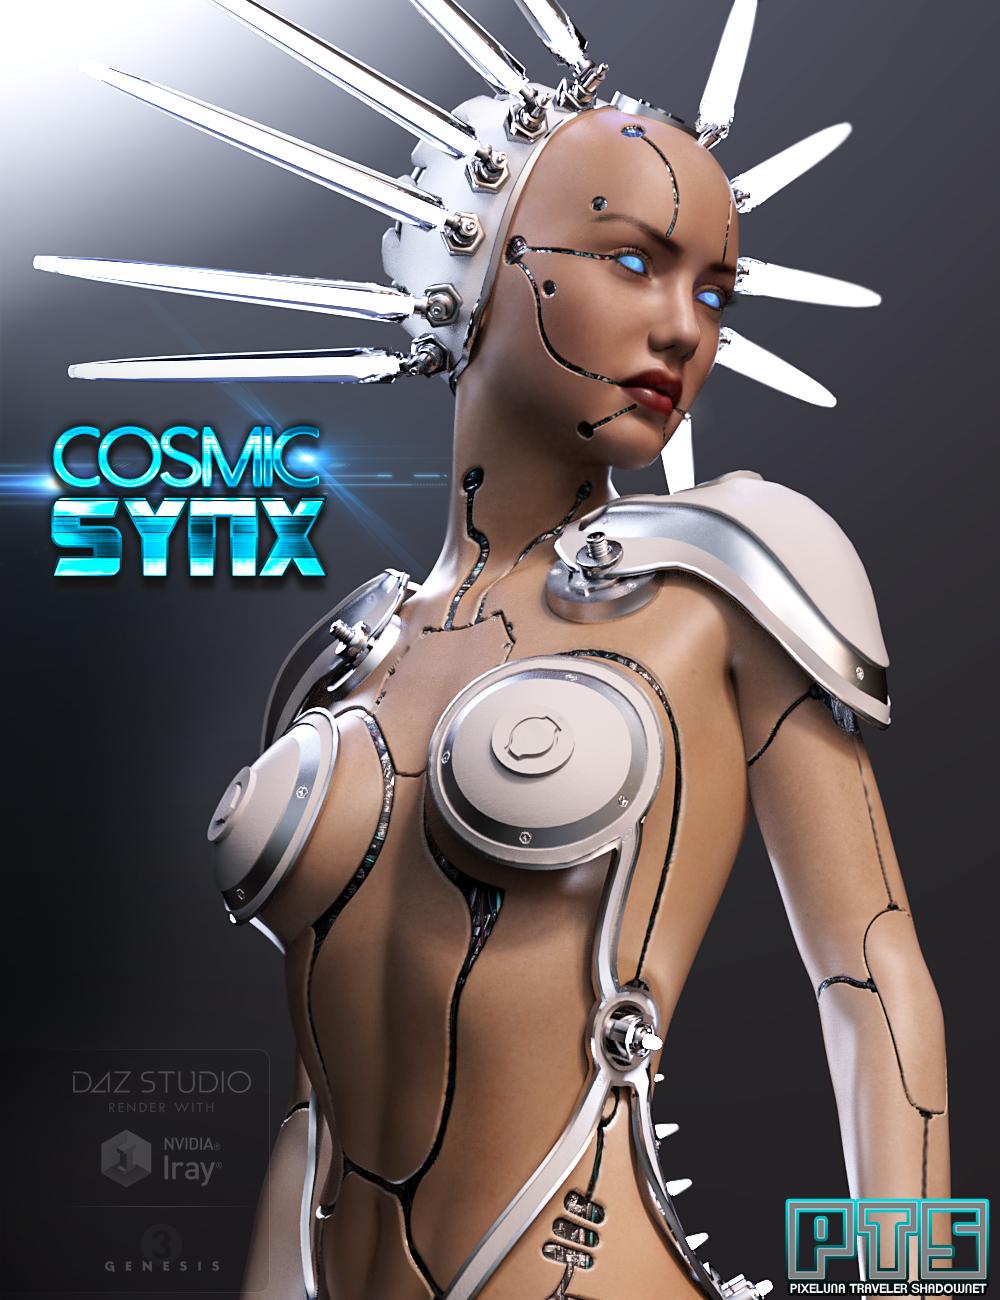 Cosmic Synx Outfit for Genesis 3 Female(s) by: PixelunaTravelershadownet, 3D Models by Daz 3D